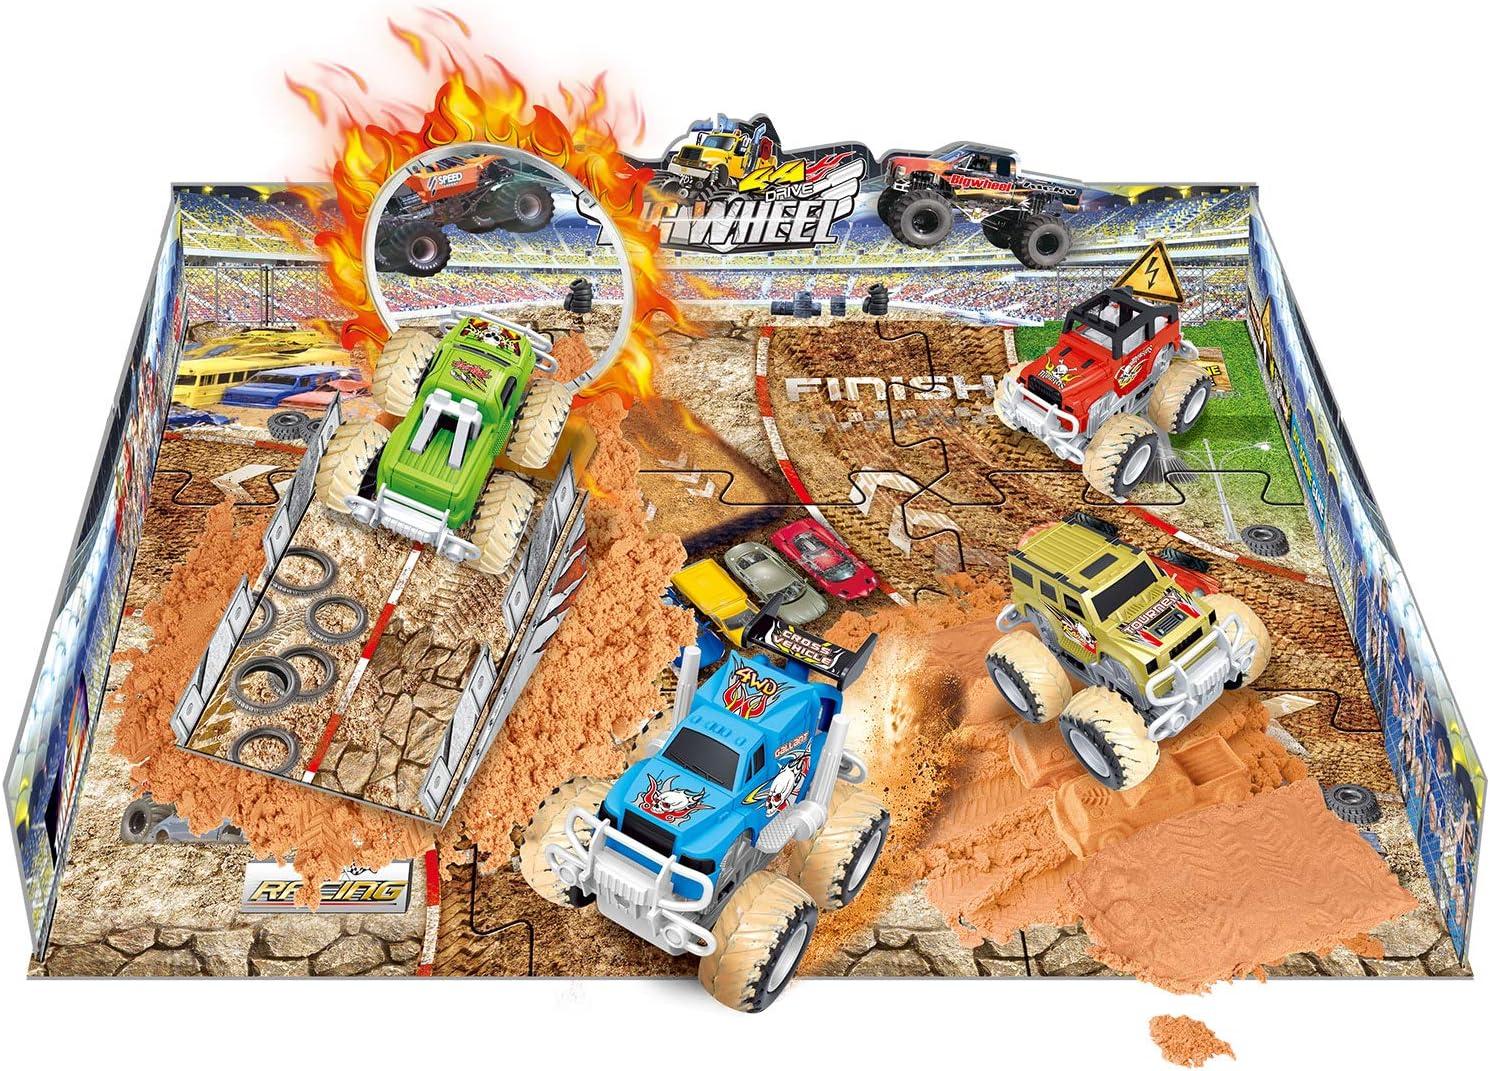 Liberty Imports Big Wheel 4x4 Monster Friction Pullback Truck Stunt Stadium - Includes 2 Vehicles, Molding Sand, Play Mat (38 Pcs)